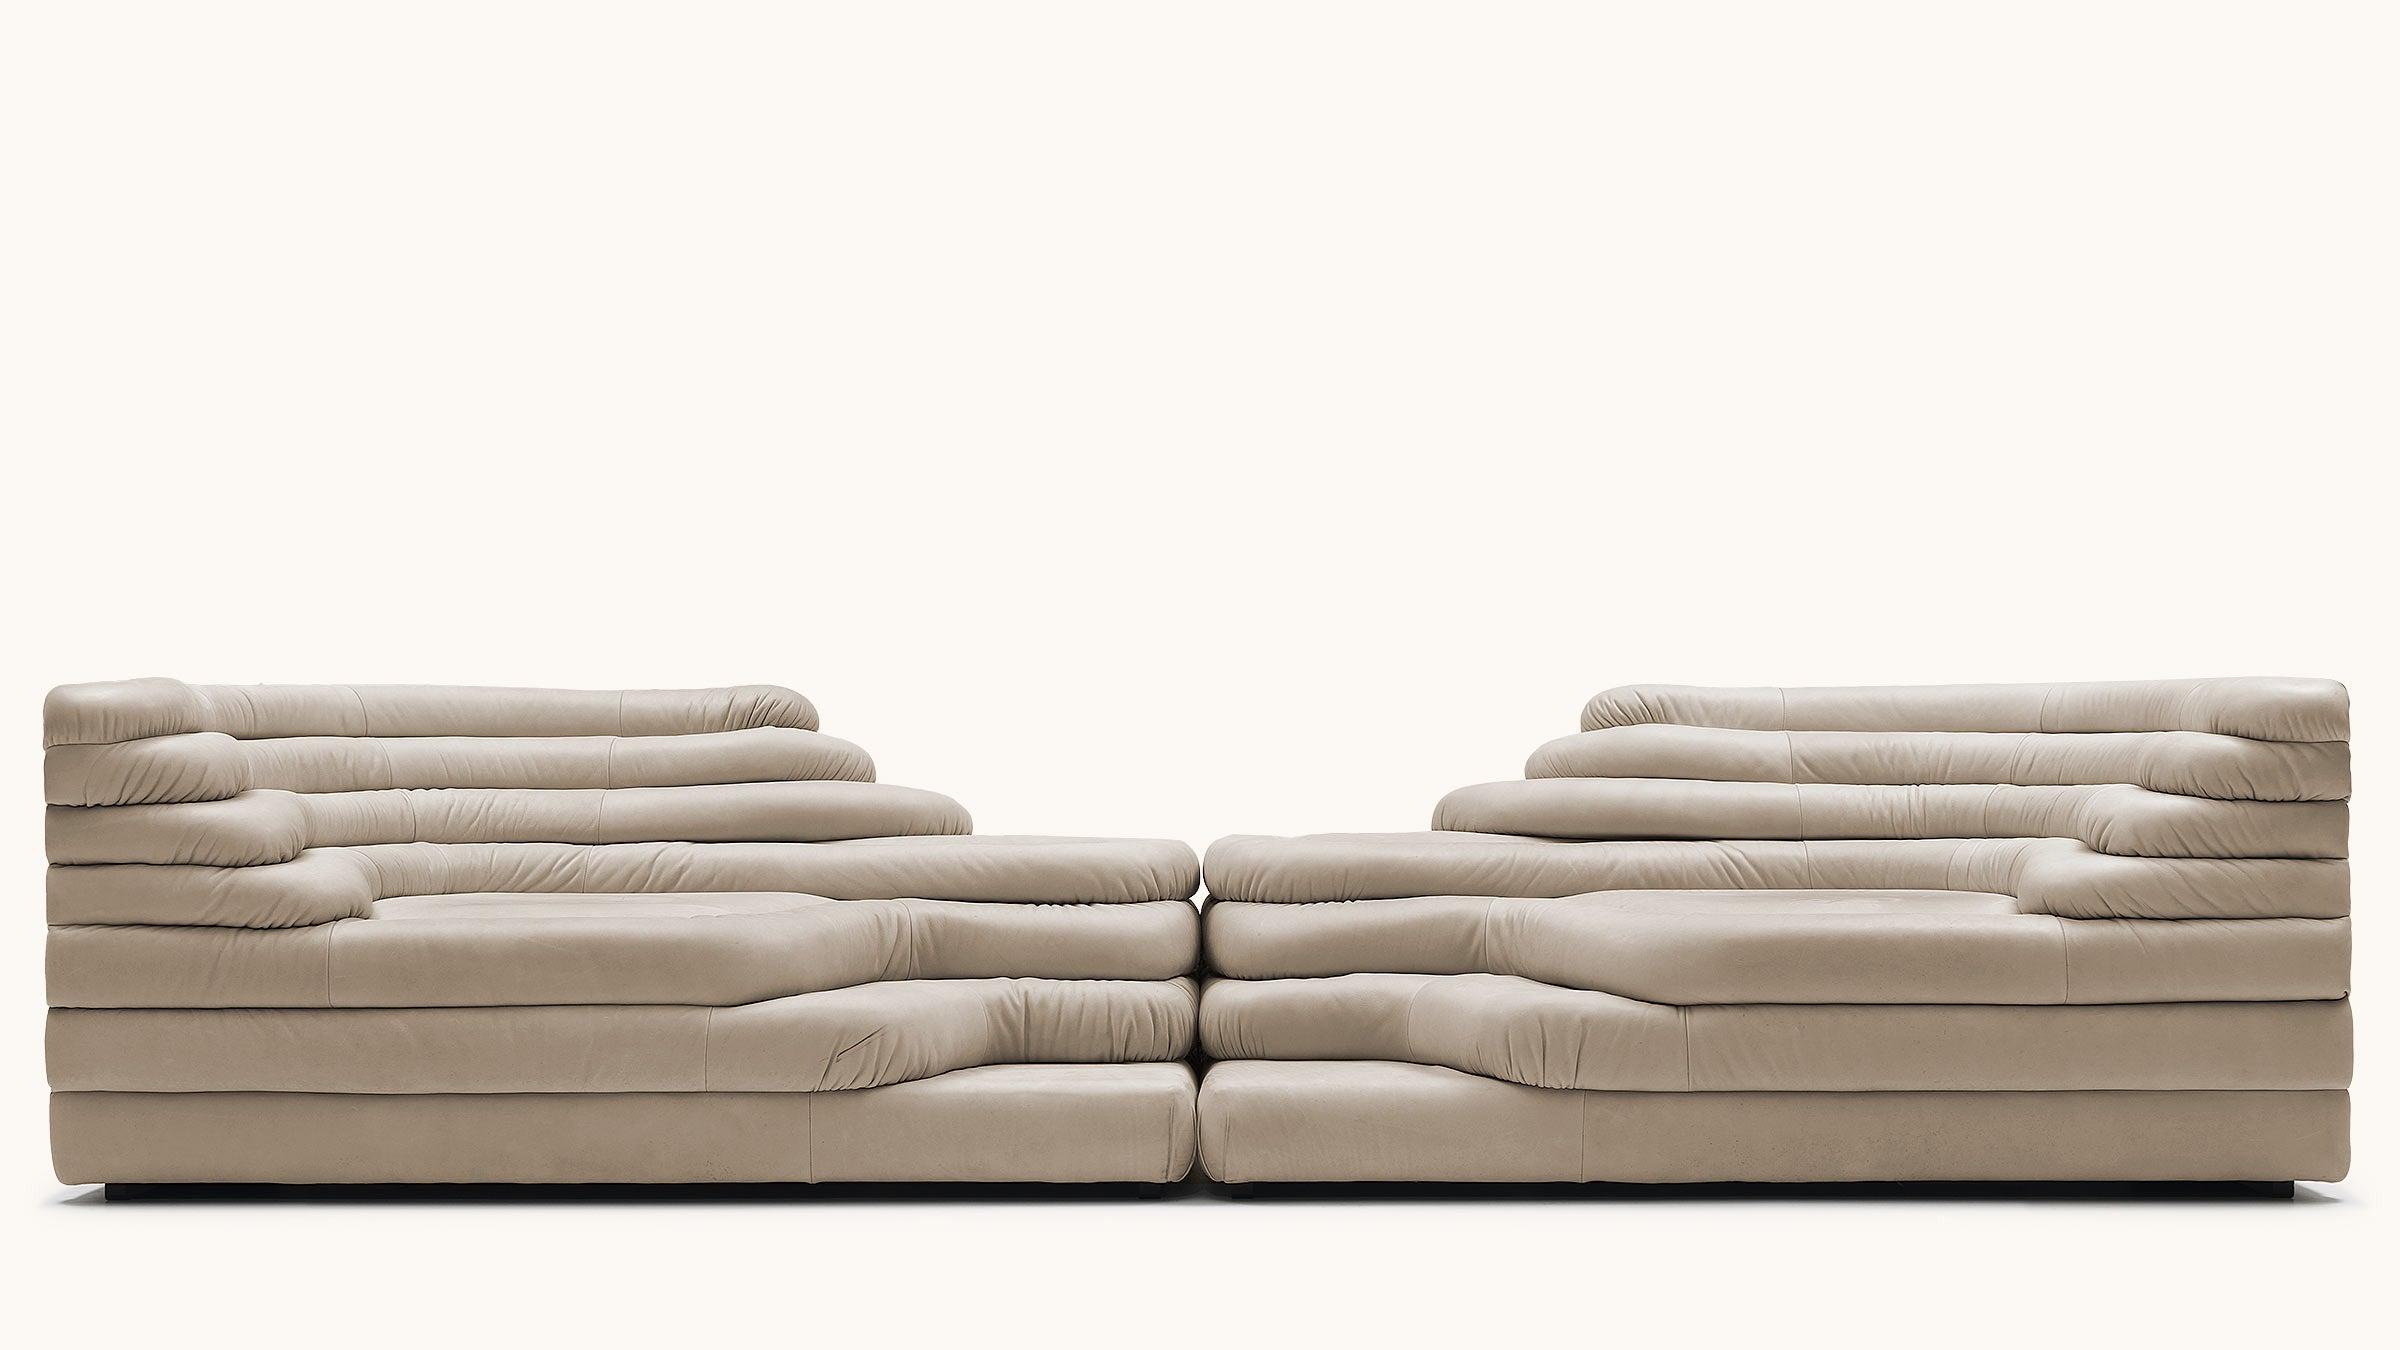 De Sede DS-1025/09 Terrazza Sofa in Perla Upholstery by Ubald Klug